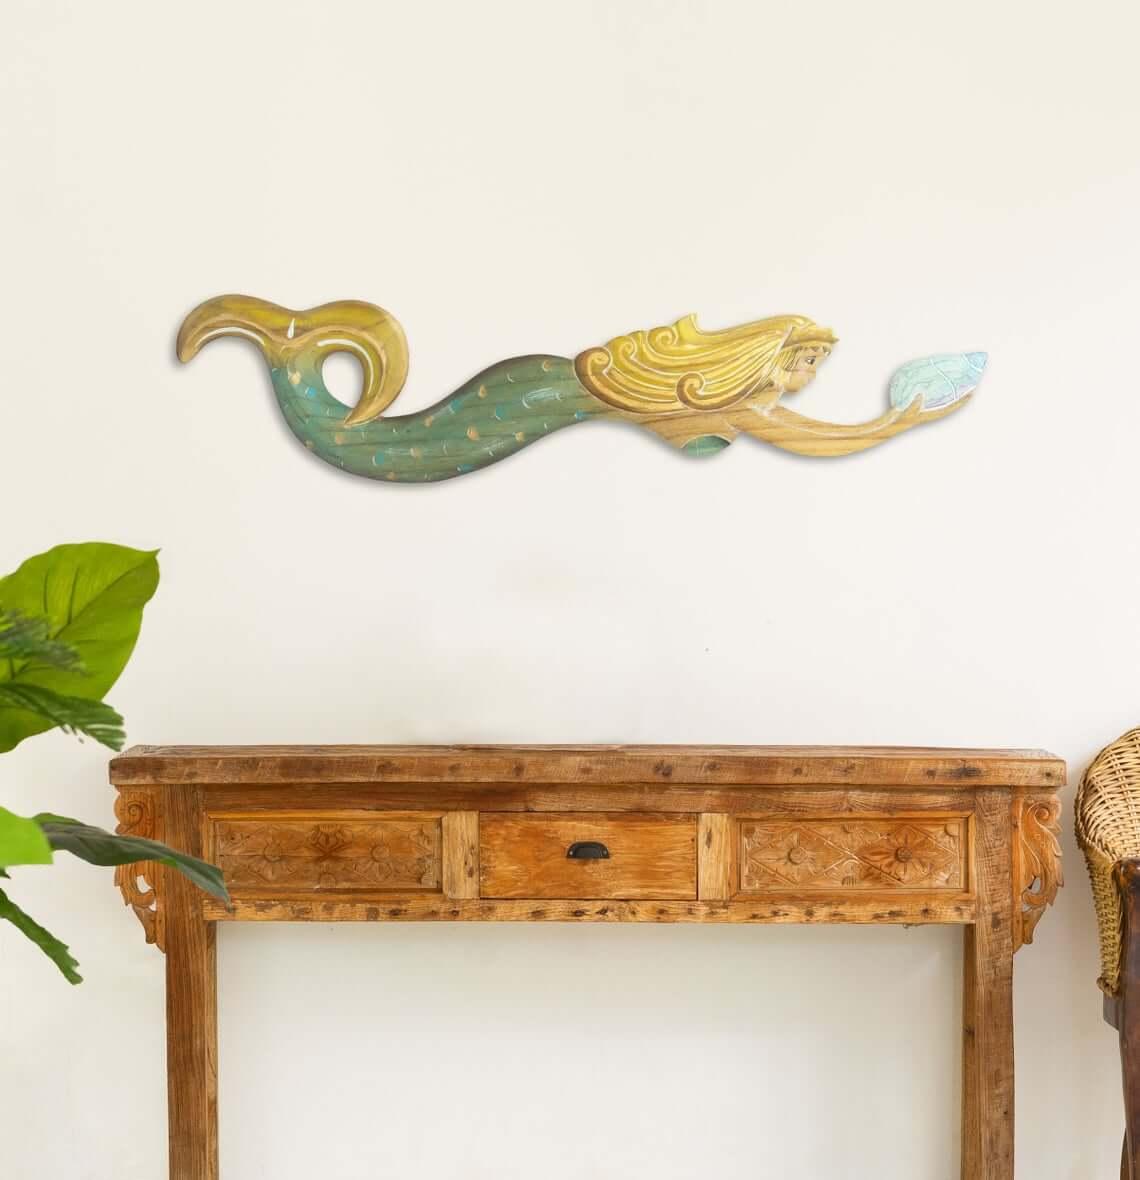 Antique Golden Mermaid Carrying Sea Life